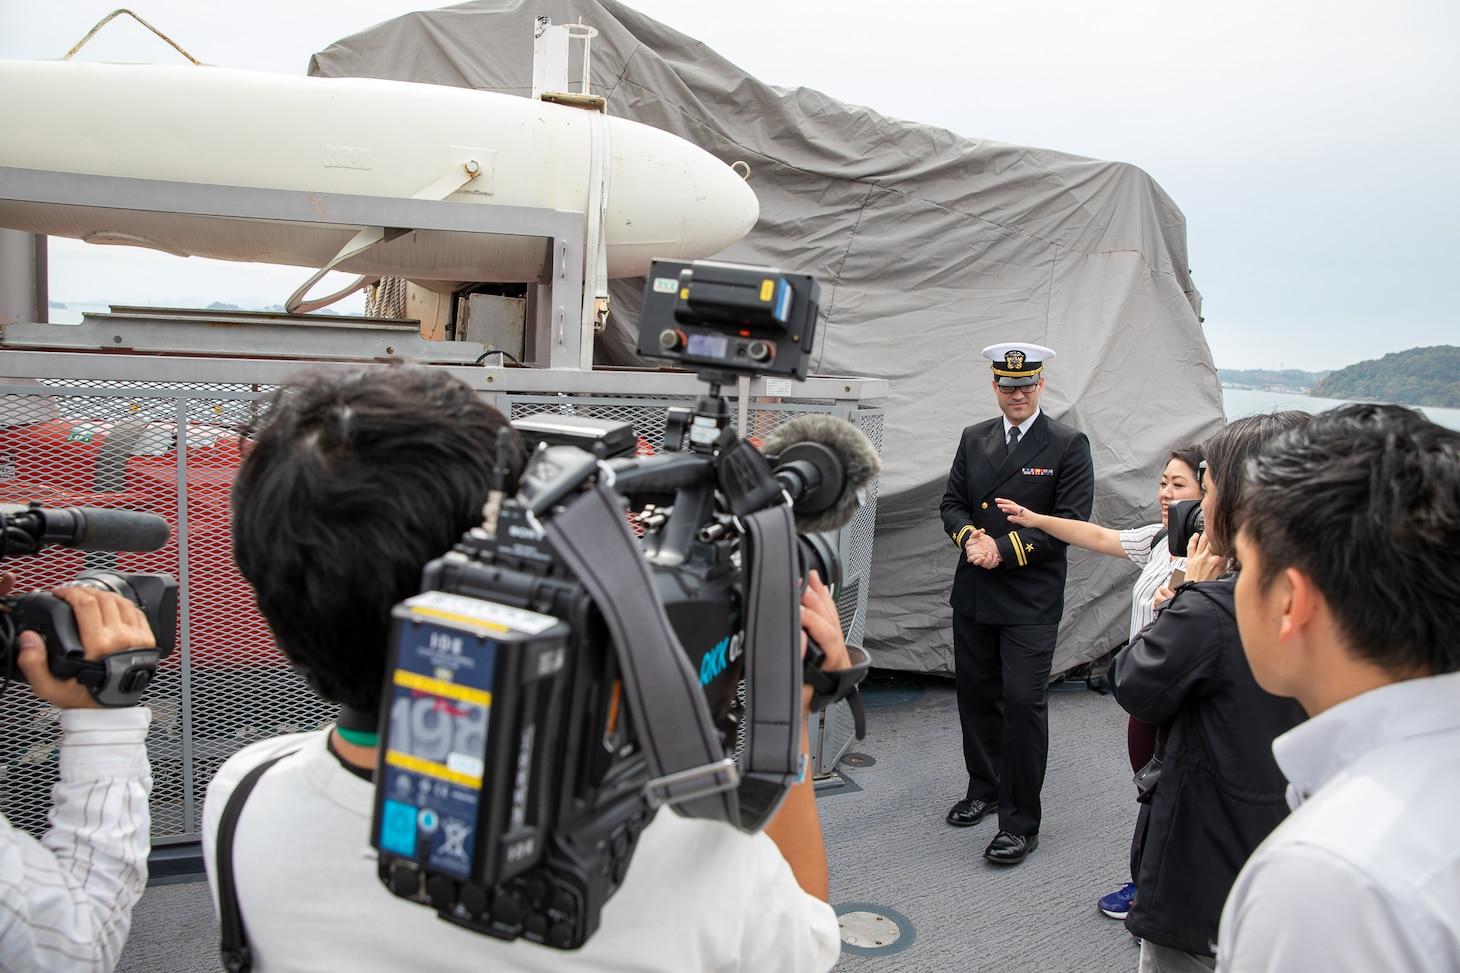 Lt. j.g. Scott Sansing, main propulsion officer of Avenger-class mine countermeasures ship USS Pioneer (MCM 9) gives a ship tour to Uki city media.